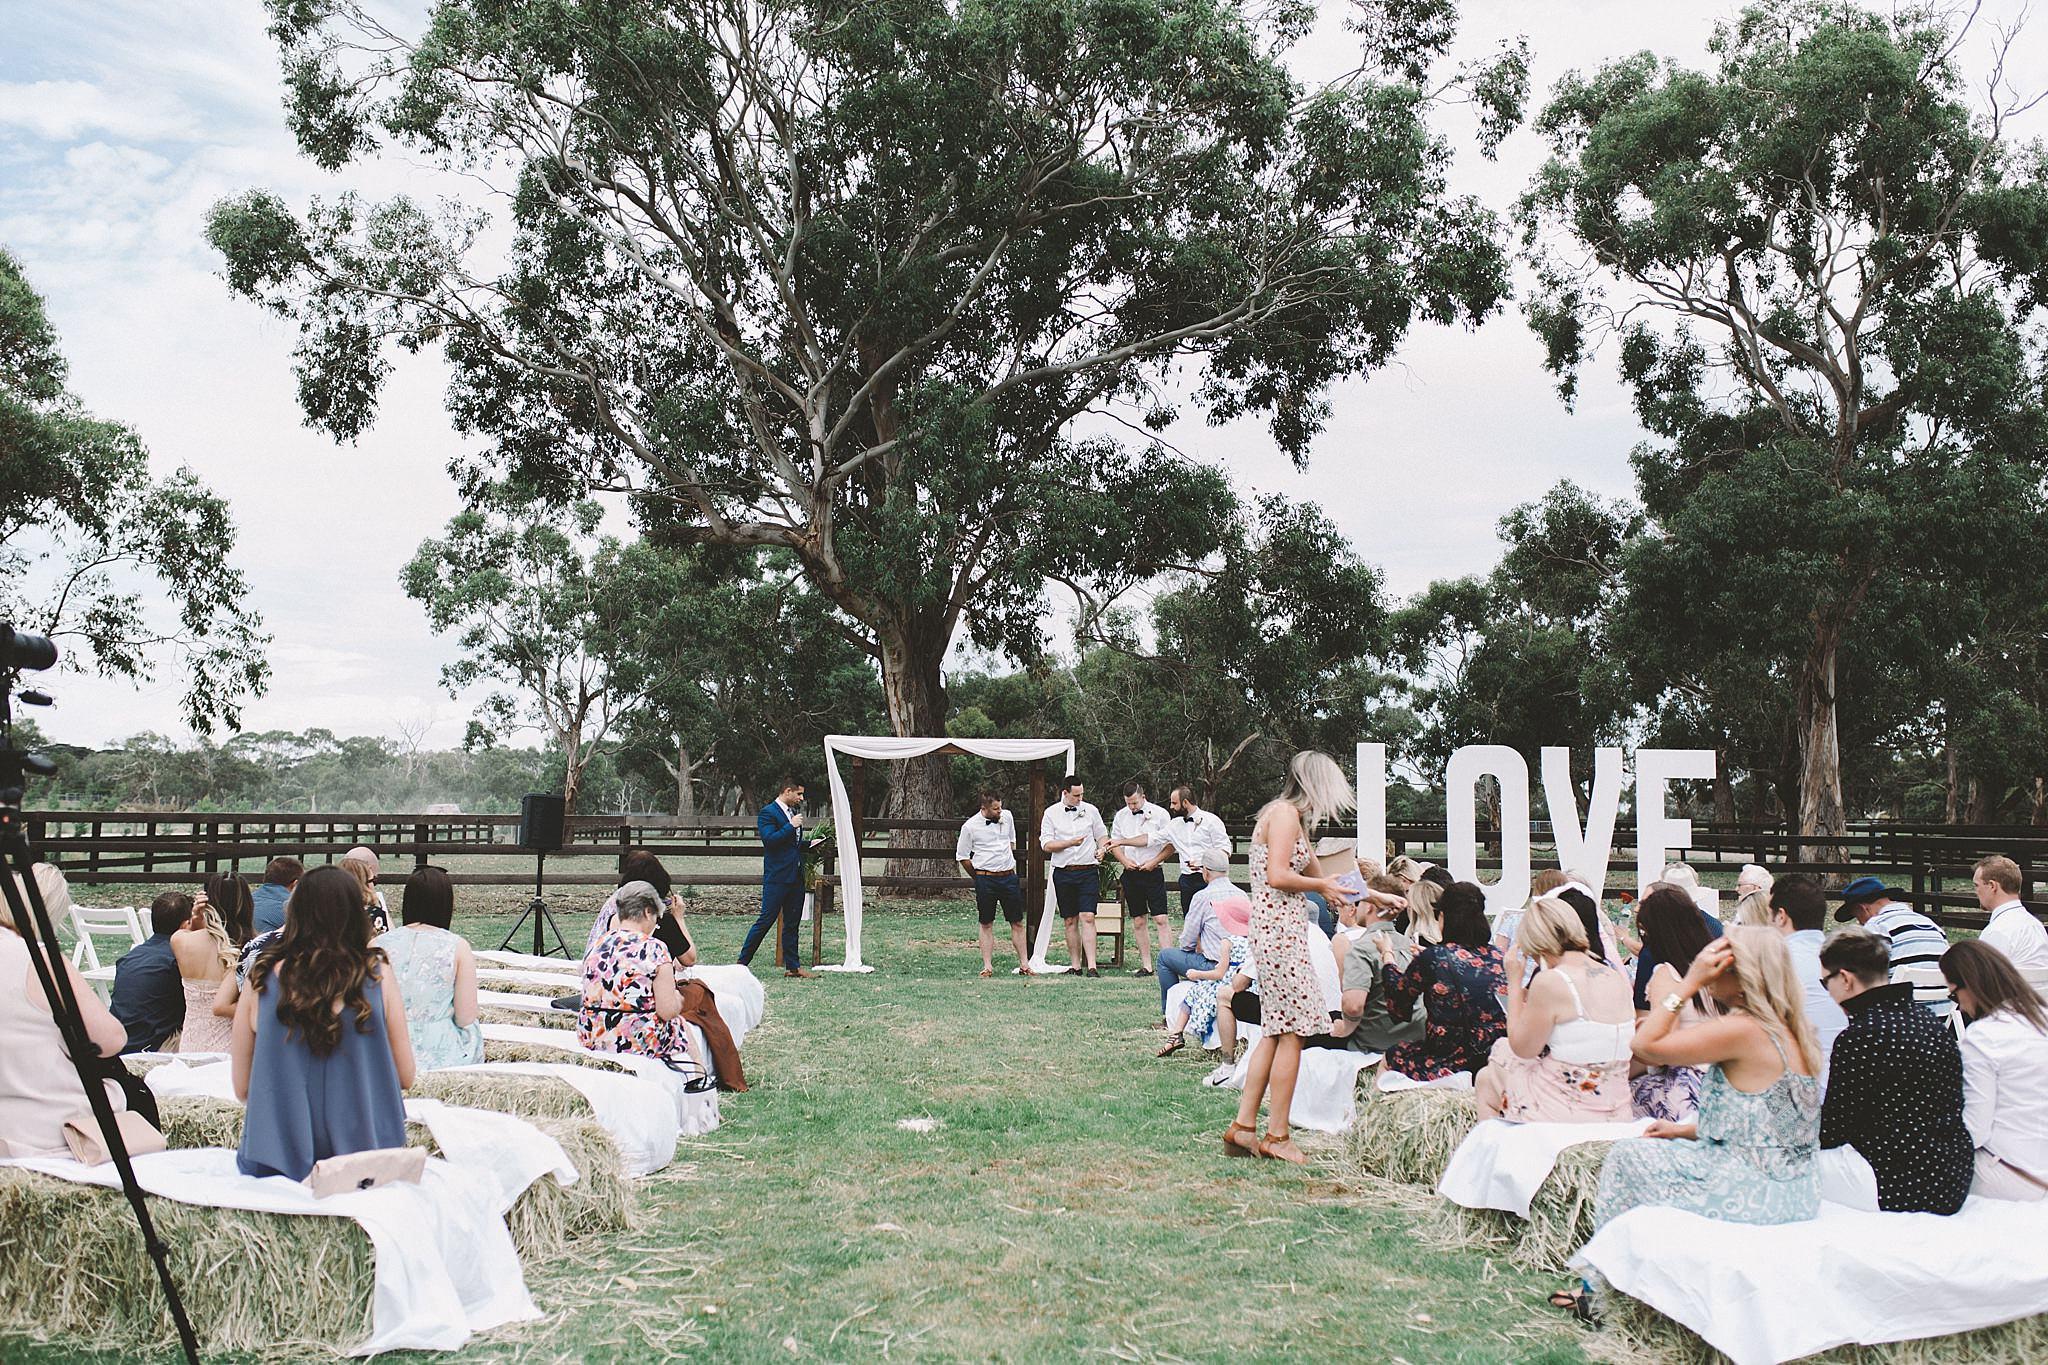 Mornington Peninsula Wedding Photographer 68.JPG